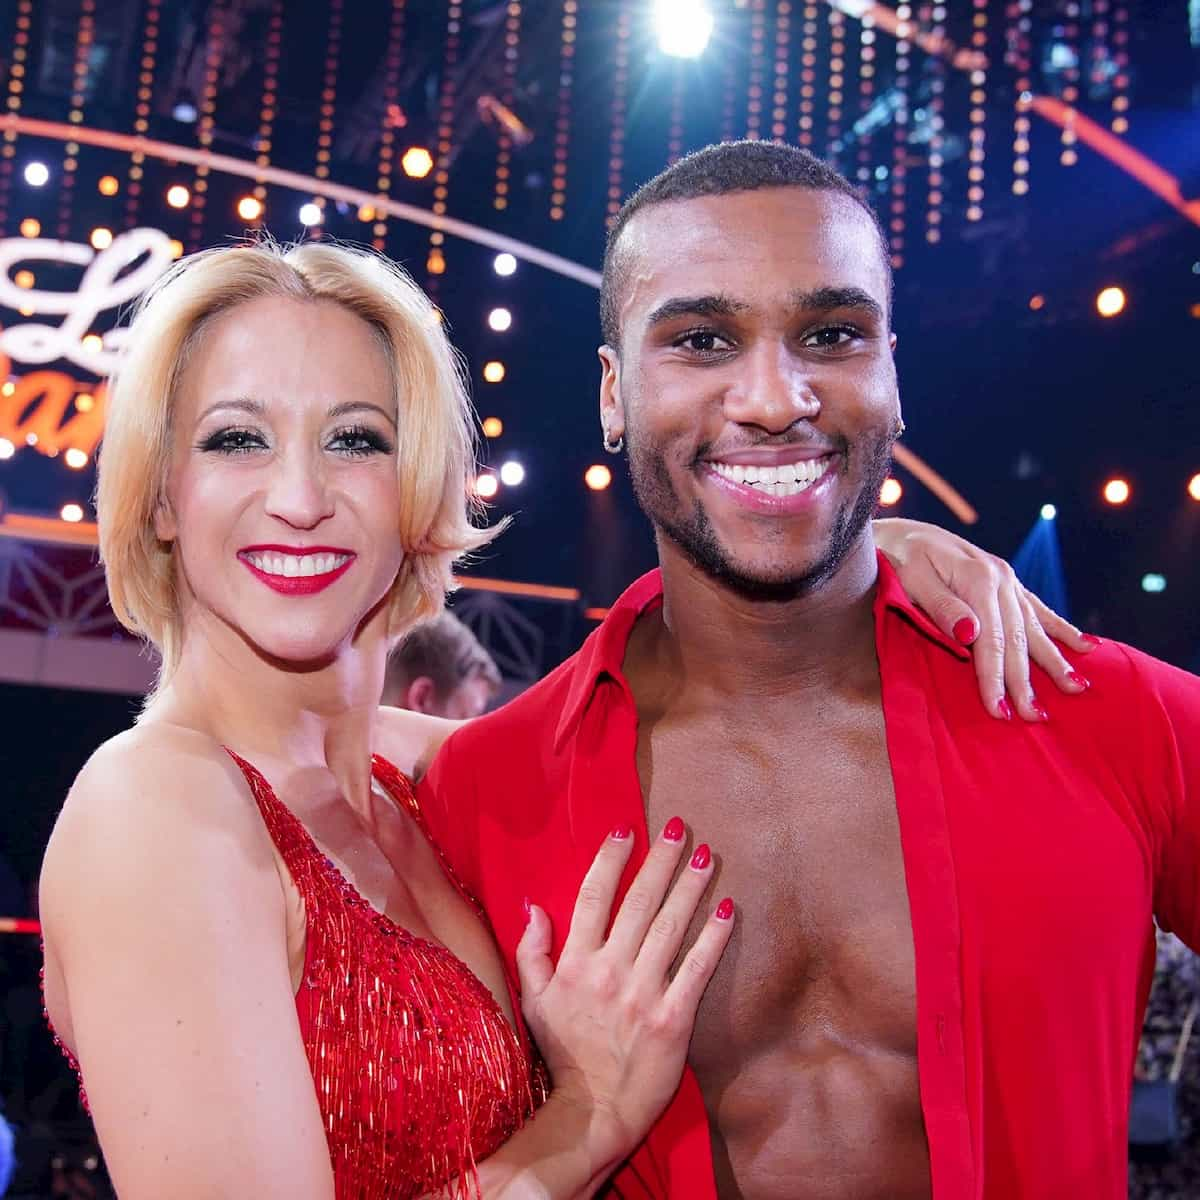 Tijan Njie und Kathrin Menzinger als Tanzpaar bei Let's dance 2020